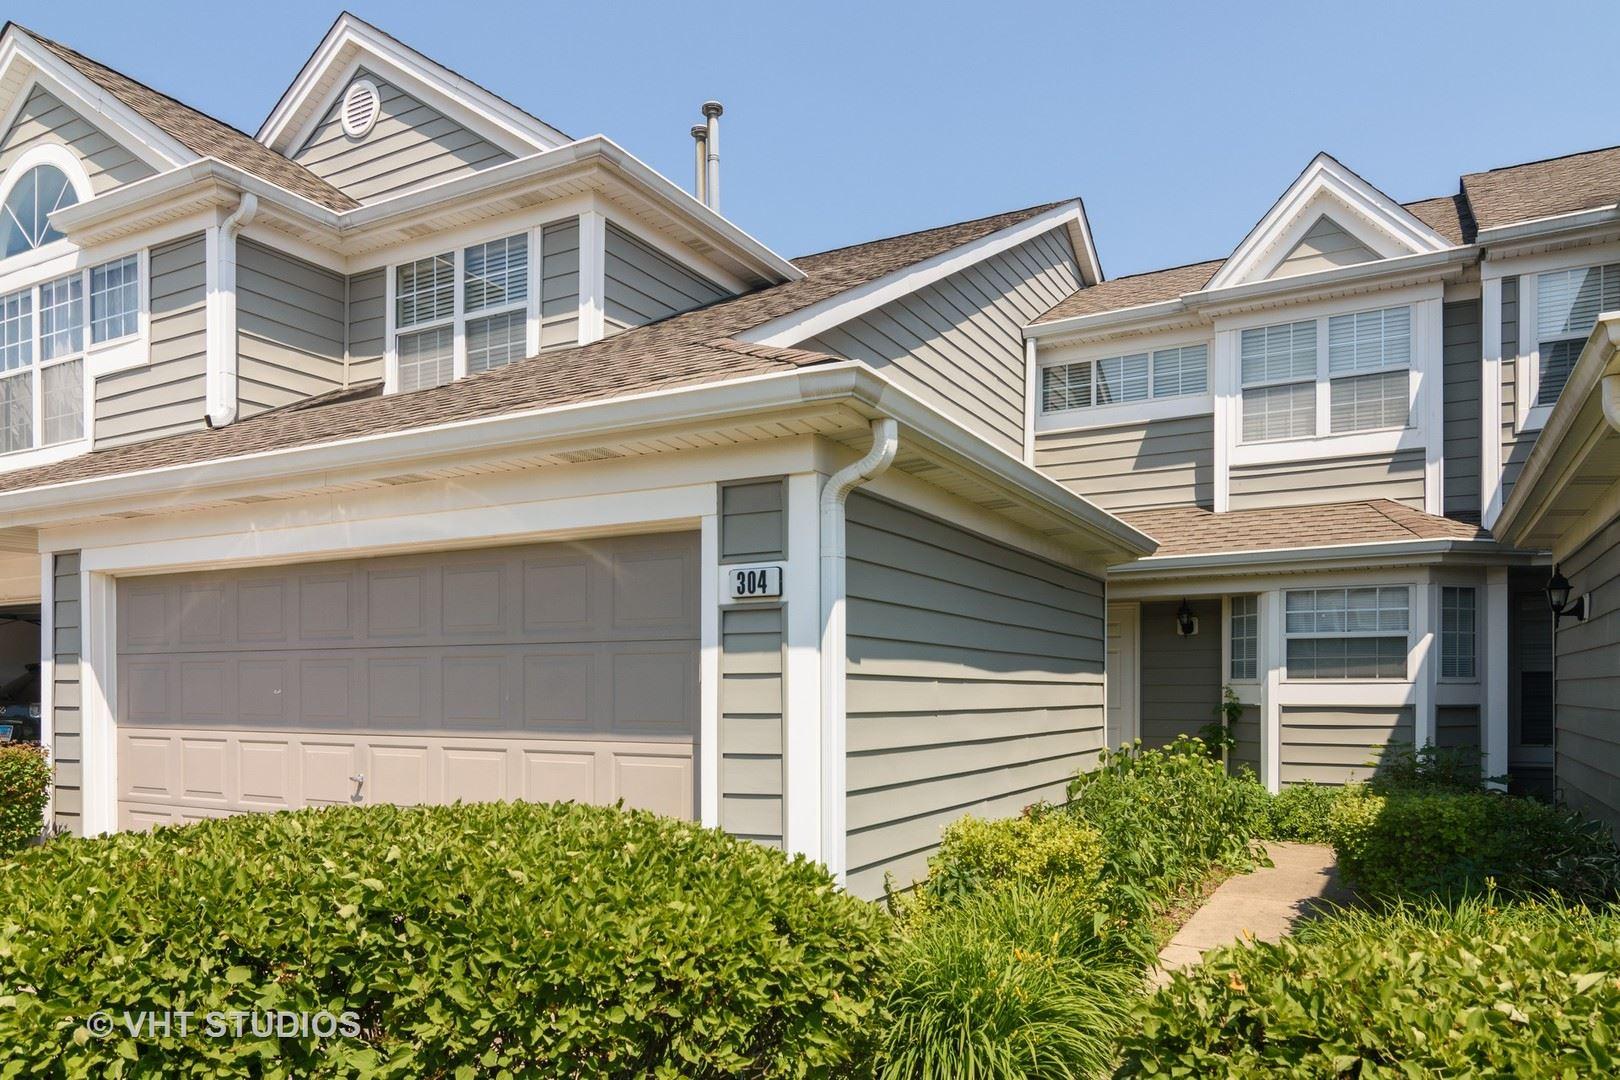 304 WOODSTONE Circle, Buffalo Grove, IL 60089 - #: 10753574